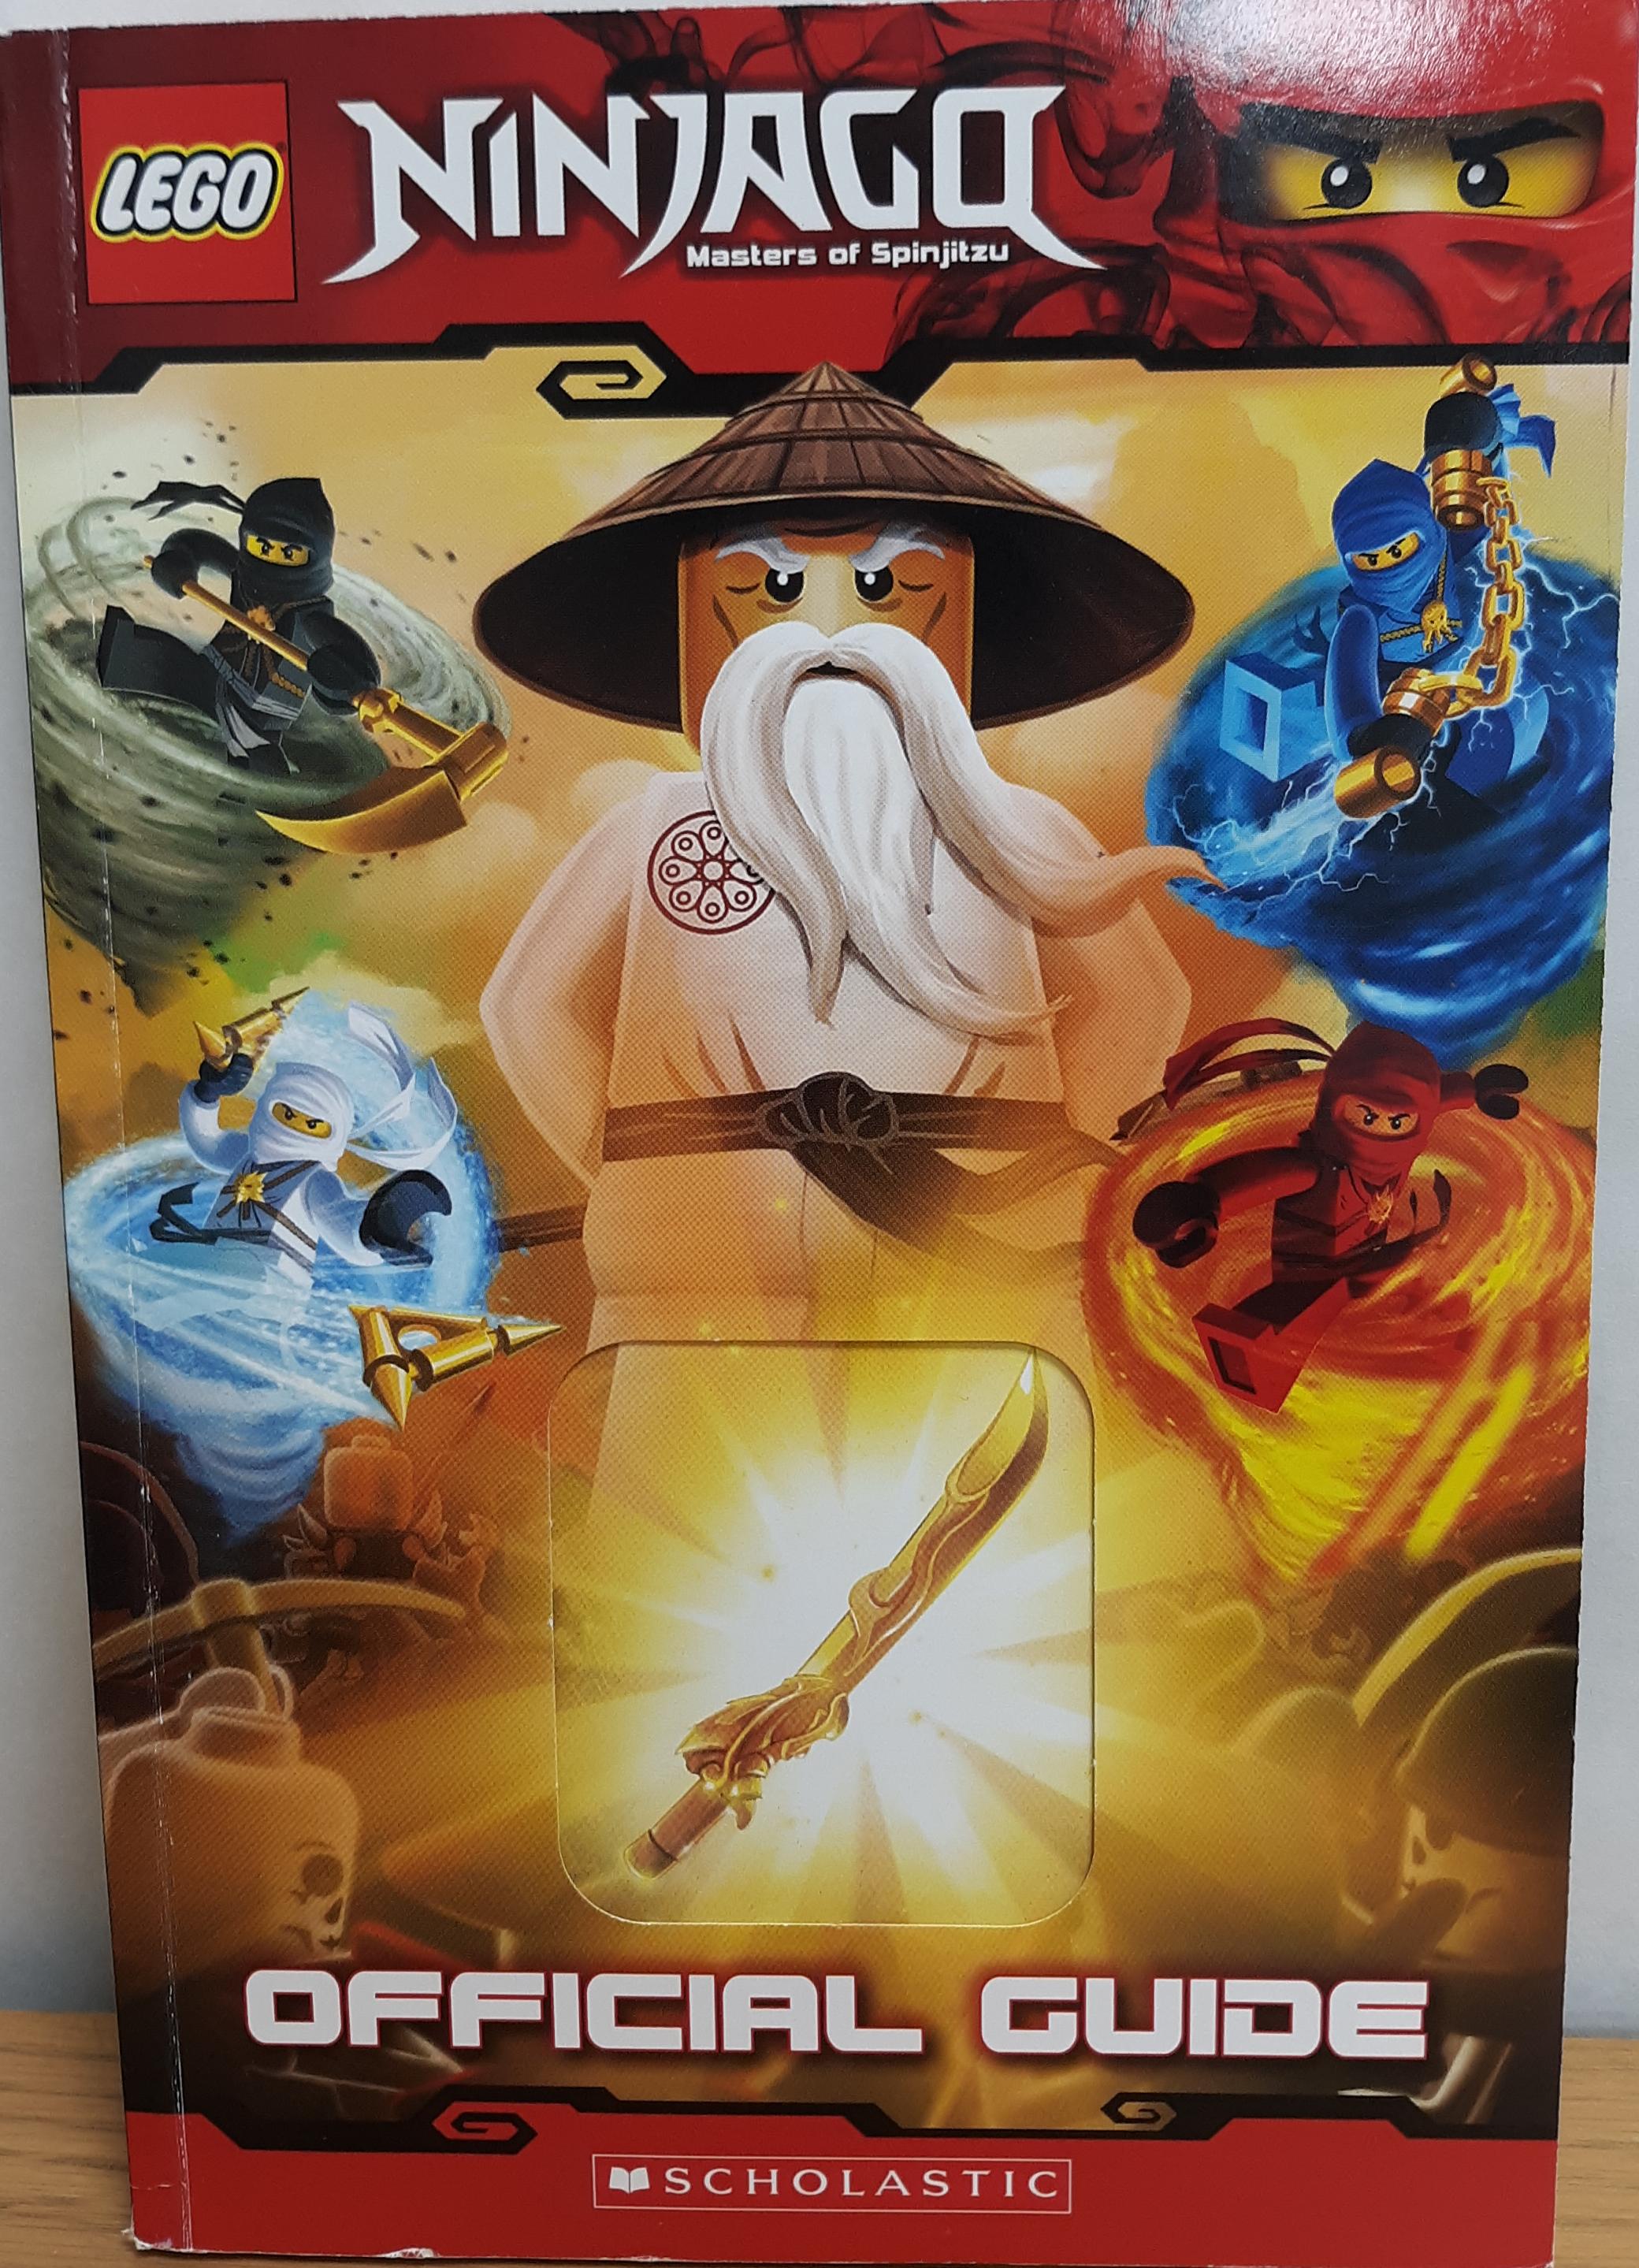 https://0201.nccdn.net/1_2/000/000/0dc/39e/ninjago-guide.png